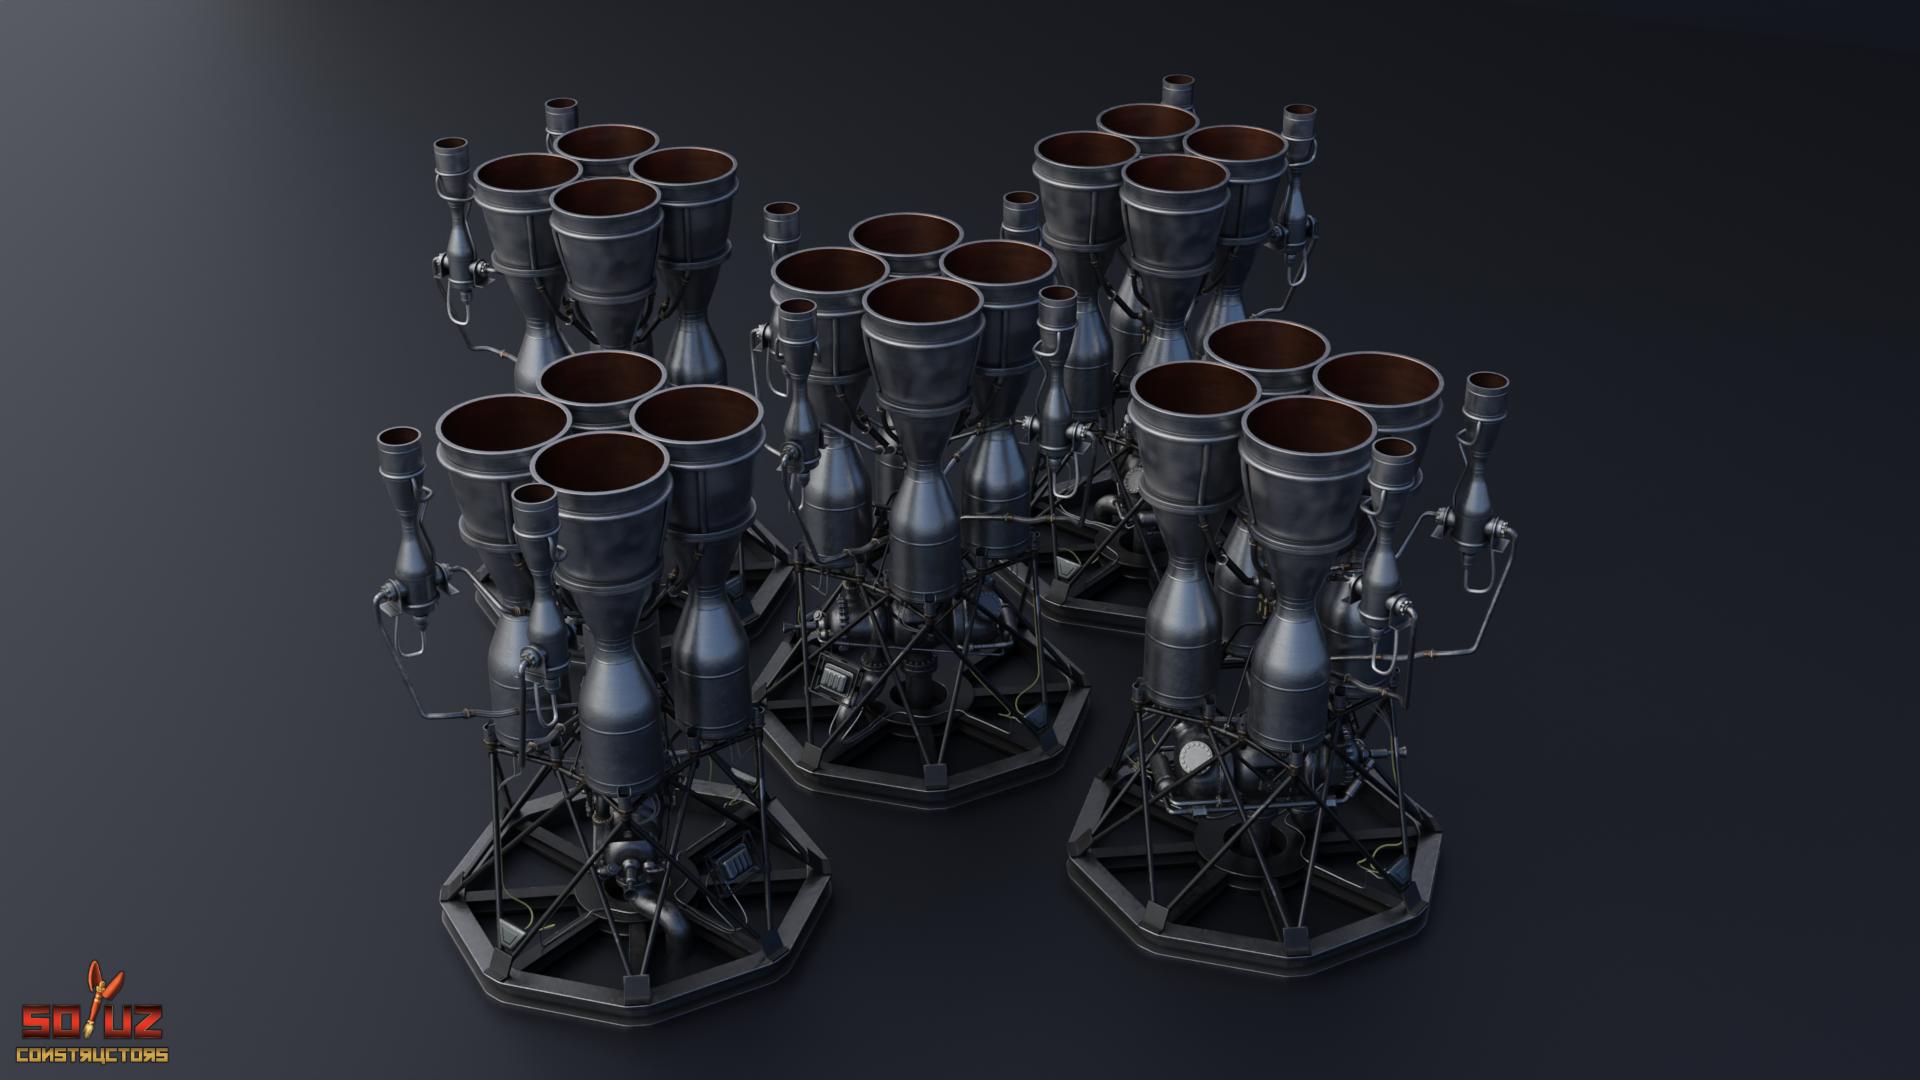 rocketengine 2